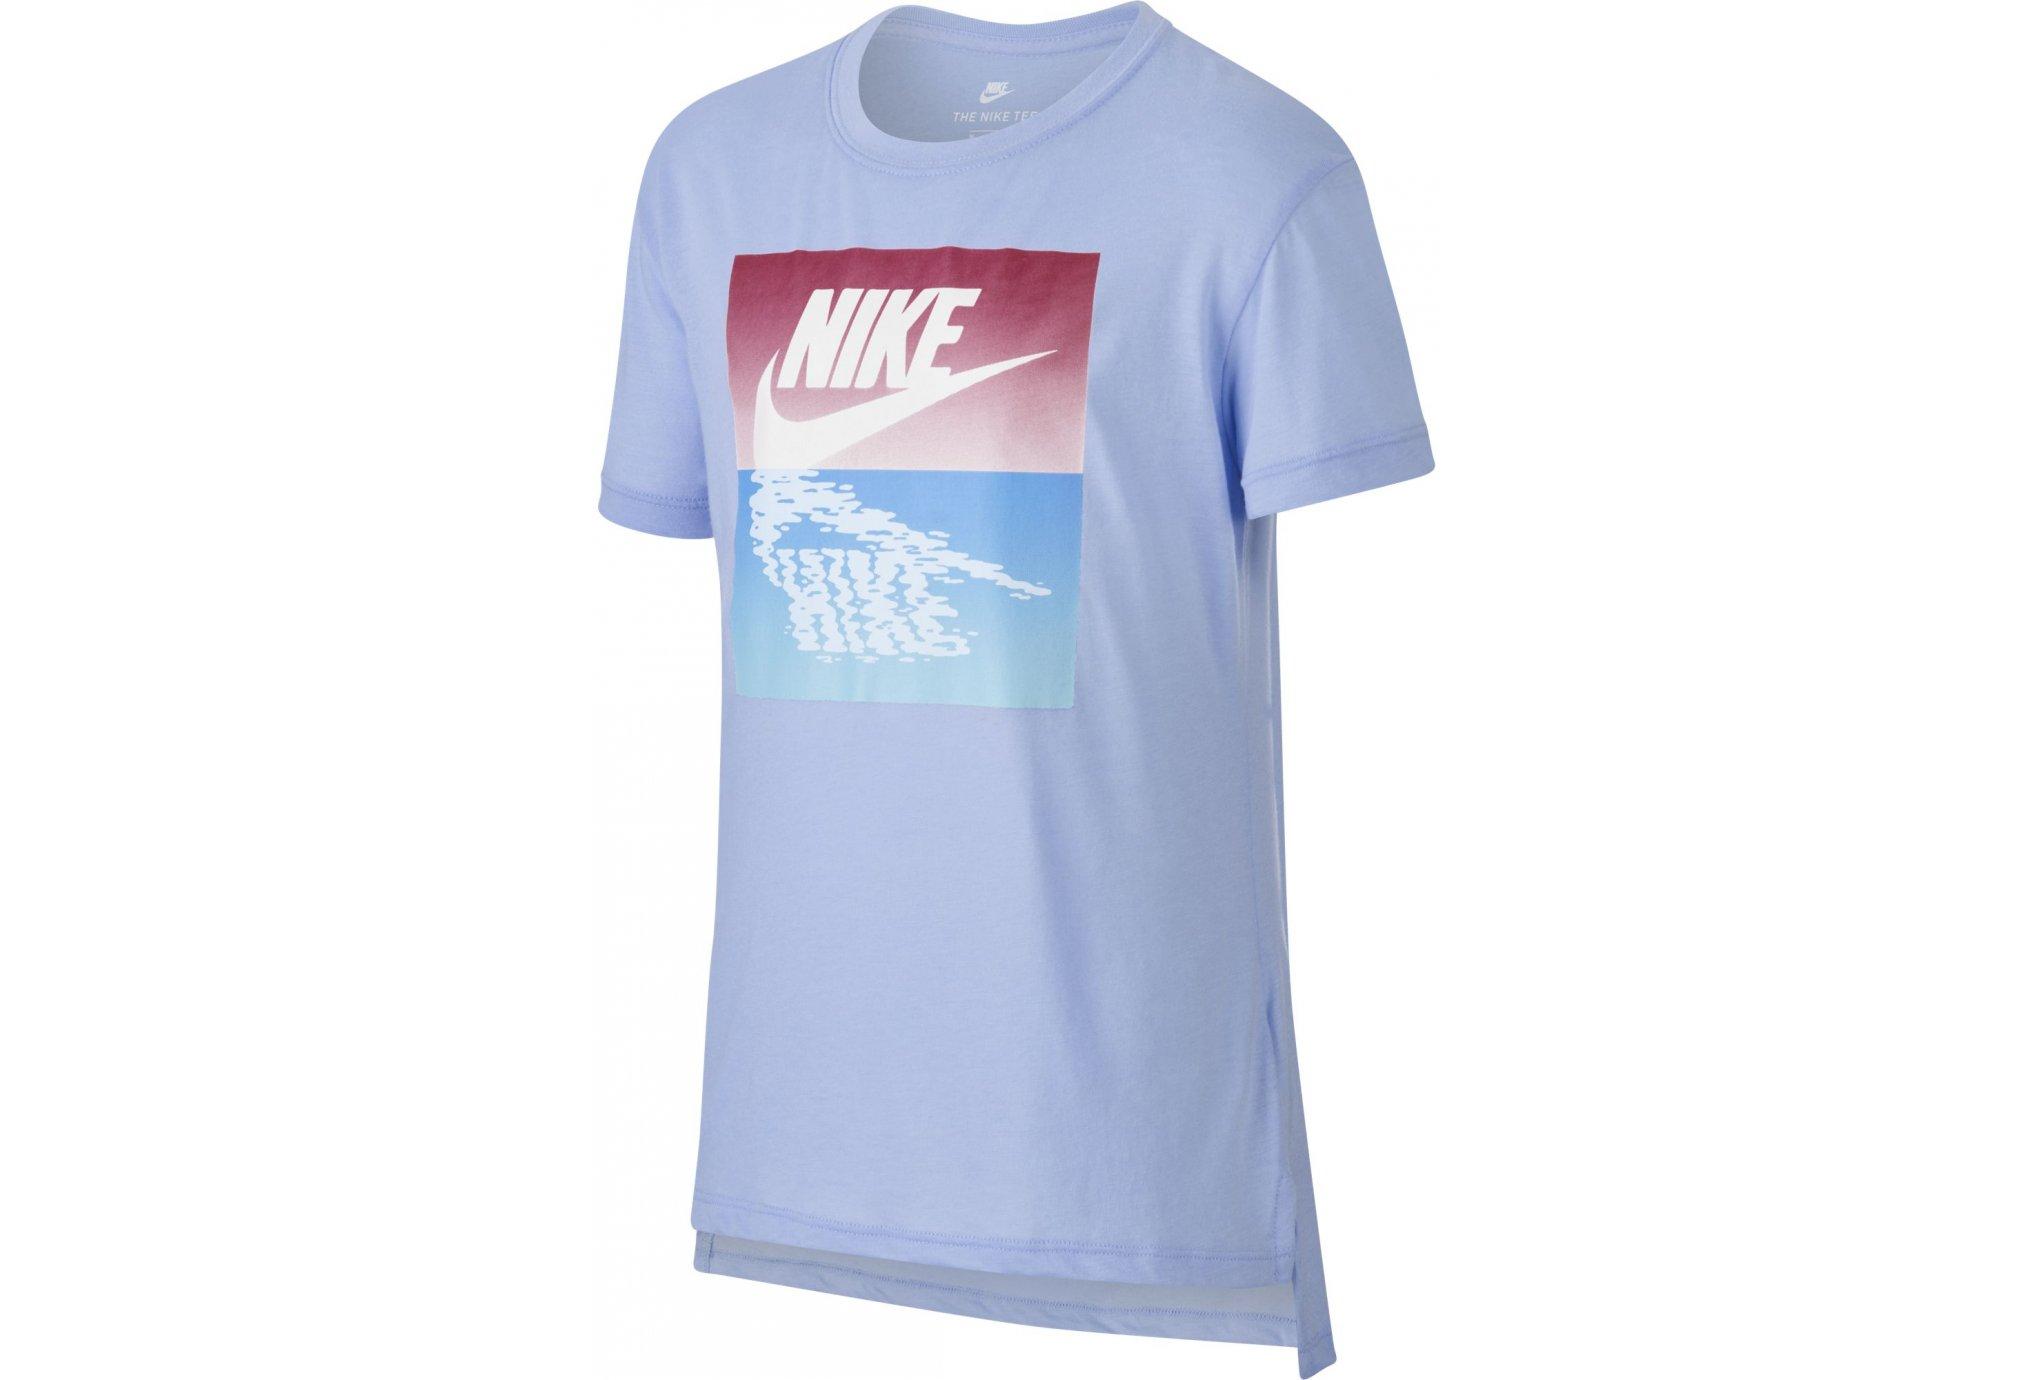 Nike Sunset Futura Fille vêtement running femme